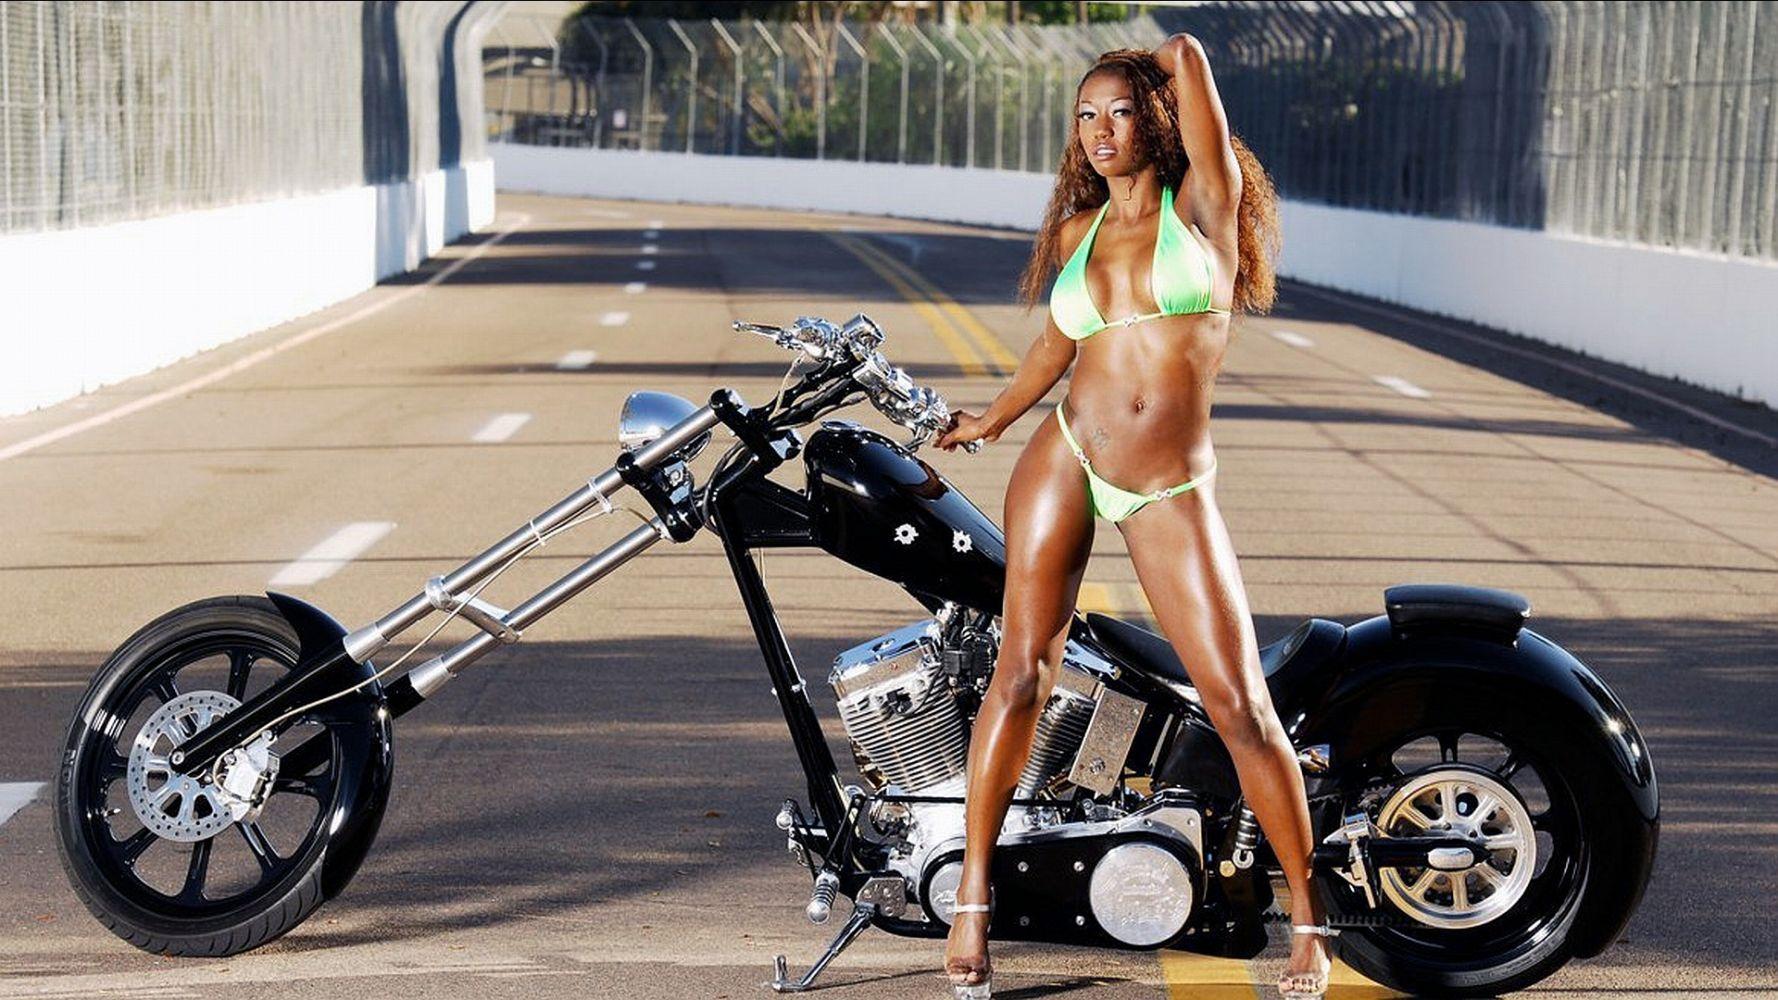 Sexy women riding their sexy motorcycles